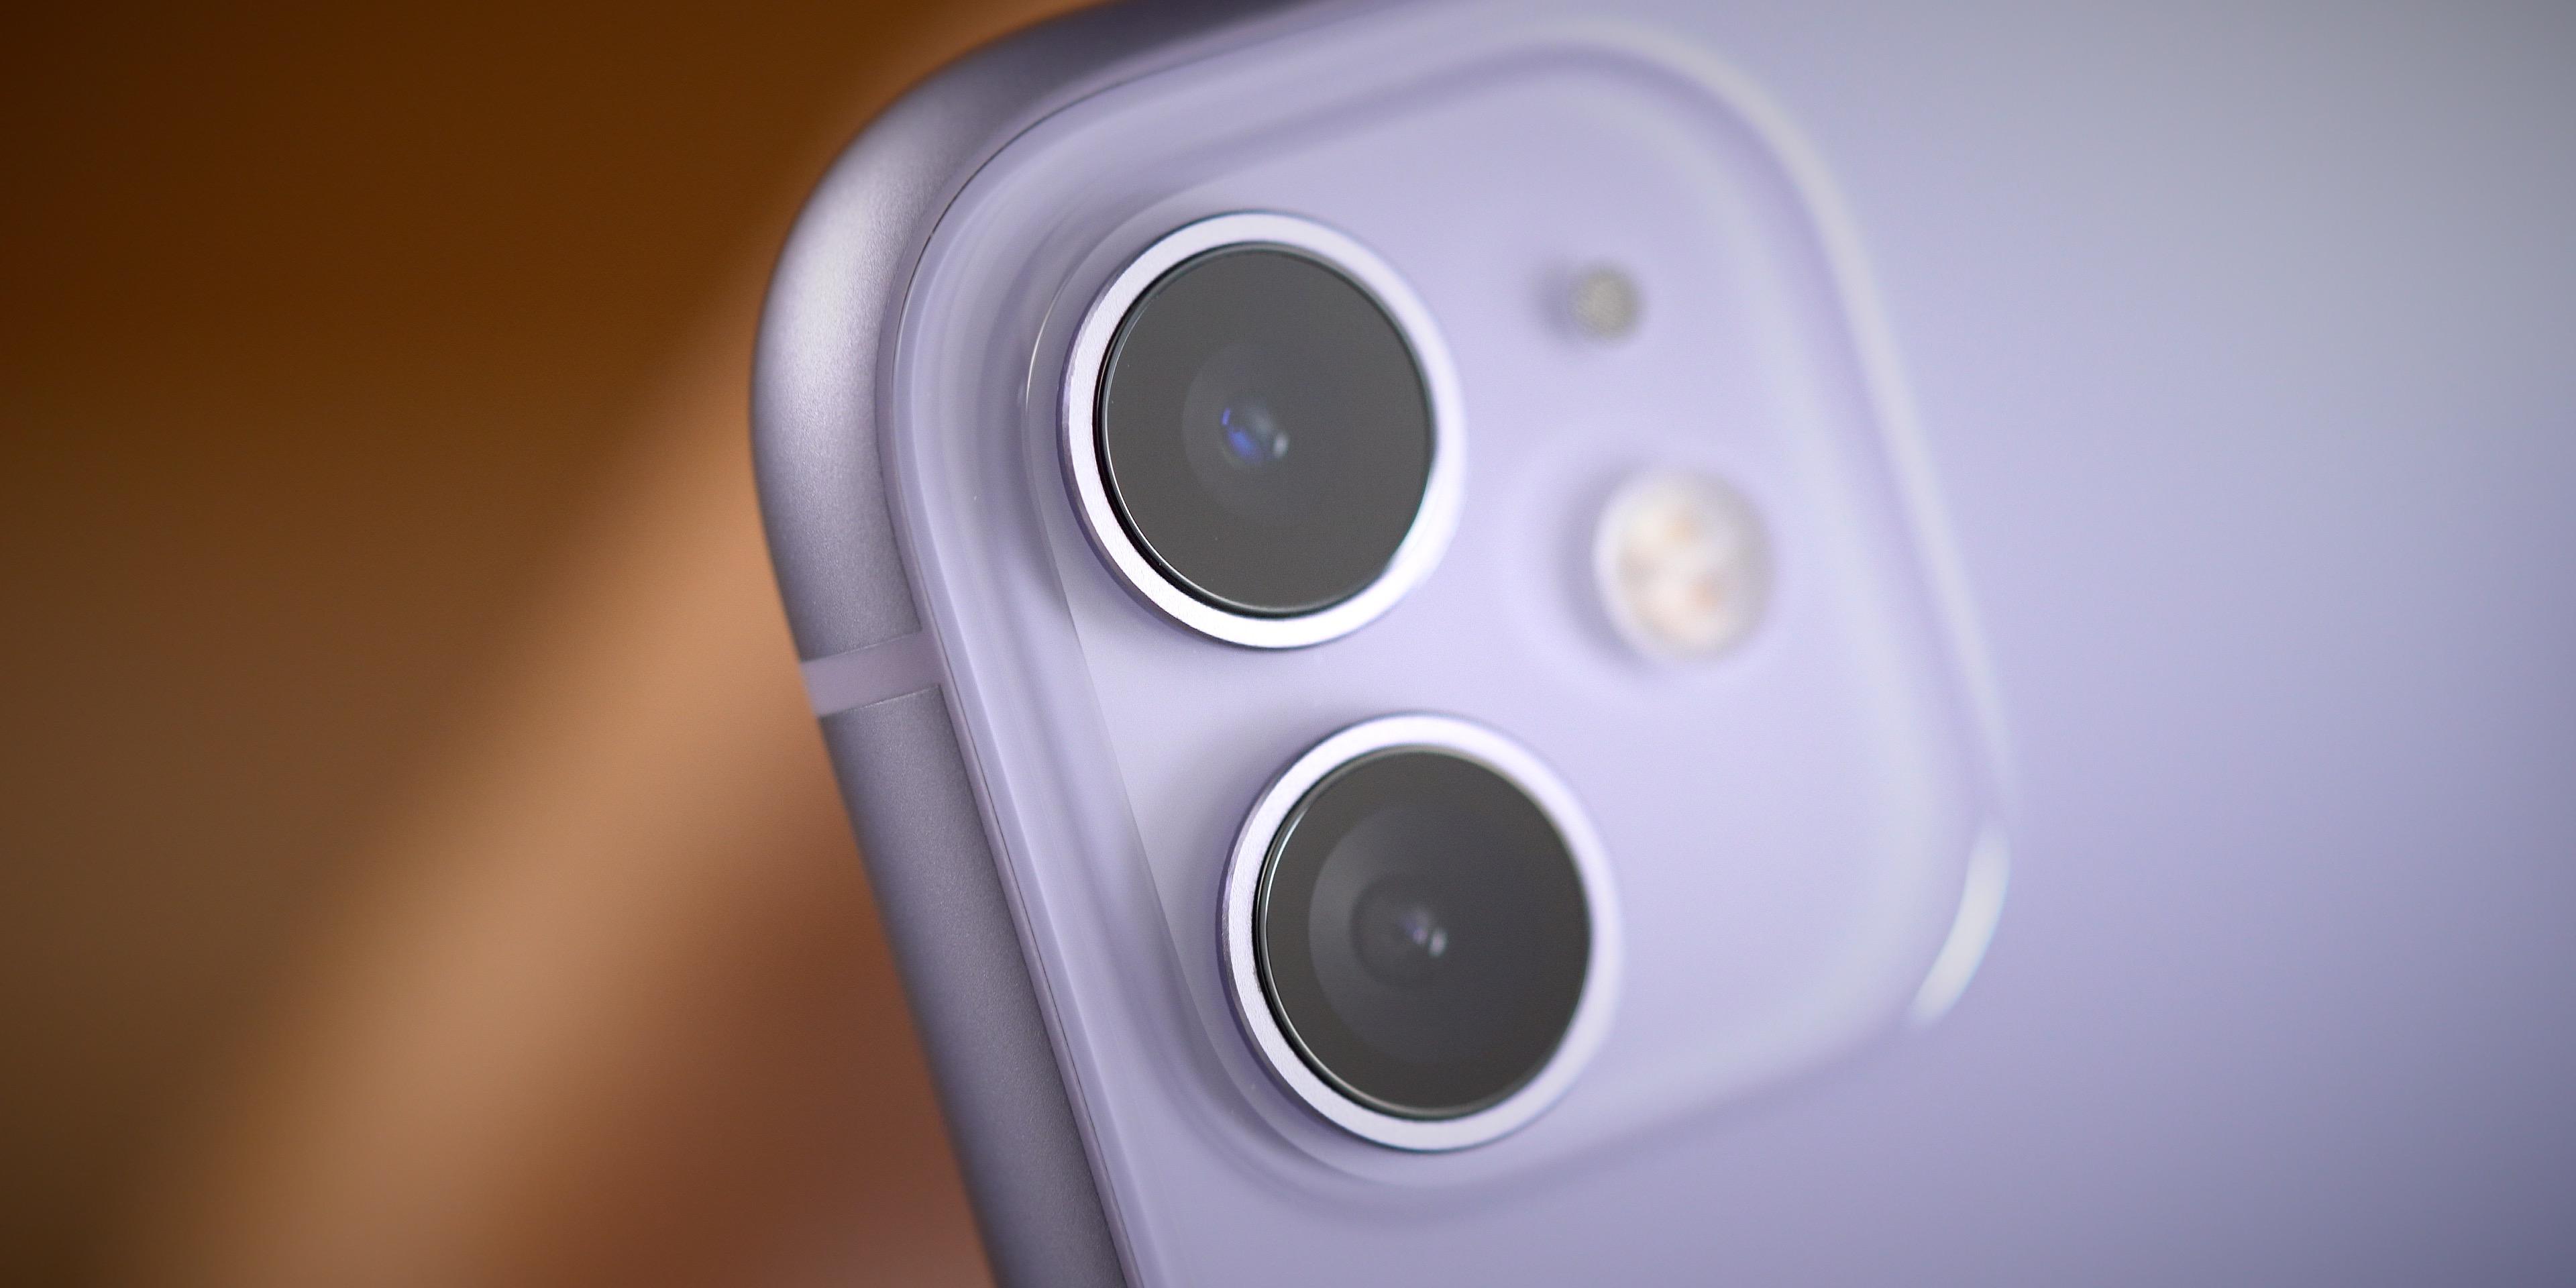 iPhone 11 dual camera up close